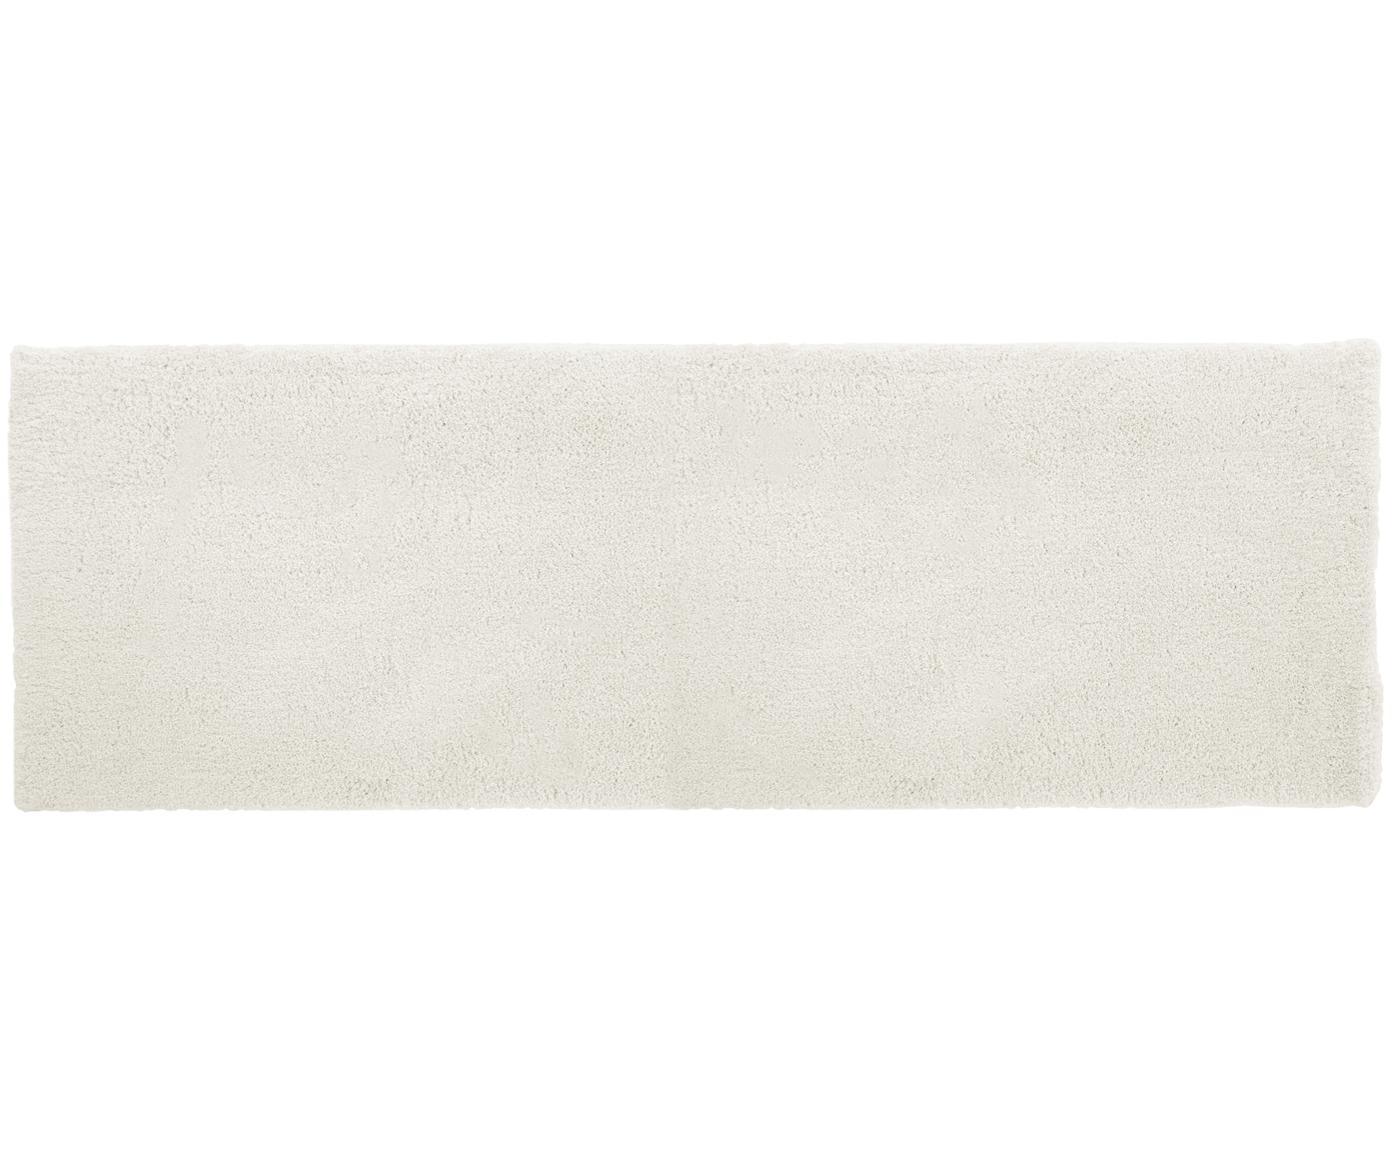 Alfombra de pelo largo Leighton, Parte superior: 100%poliéster (microfibr, Reverso: 100%poliéster, Crema, An 80 x L 250 cm